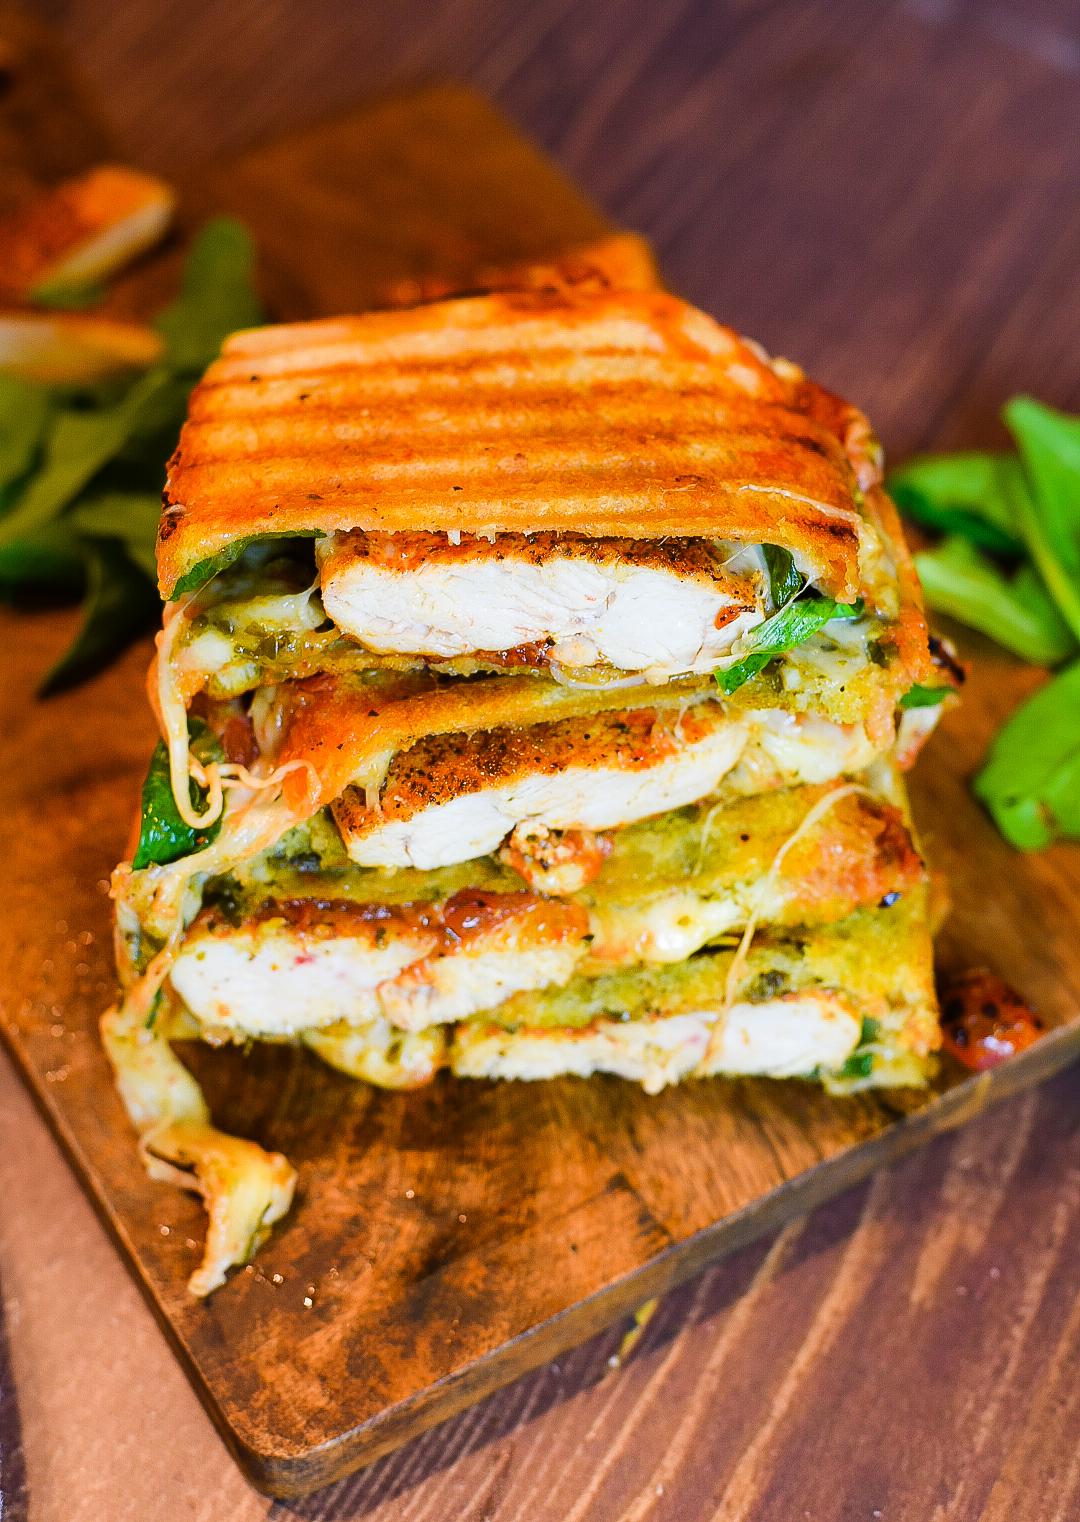 Italian Grilled Chicken Panini Sandwich Dude That Cookz